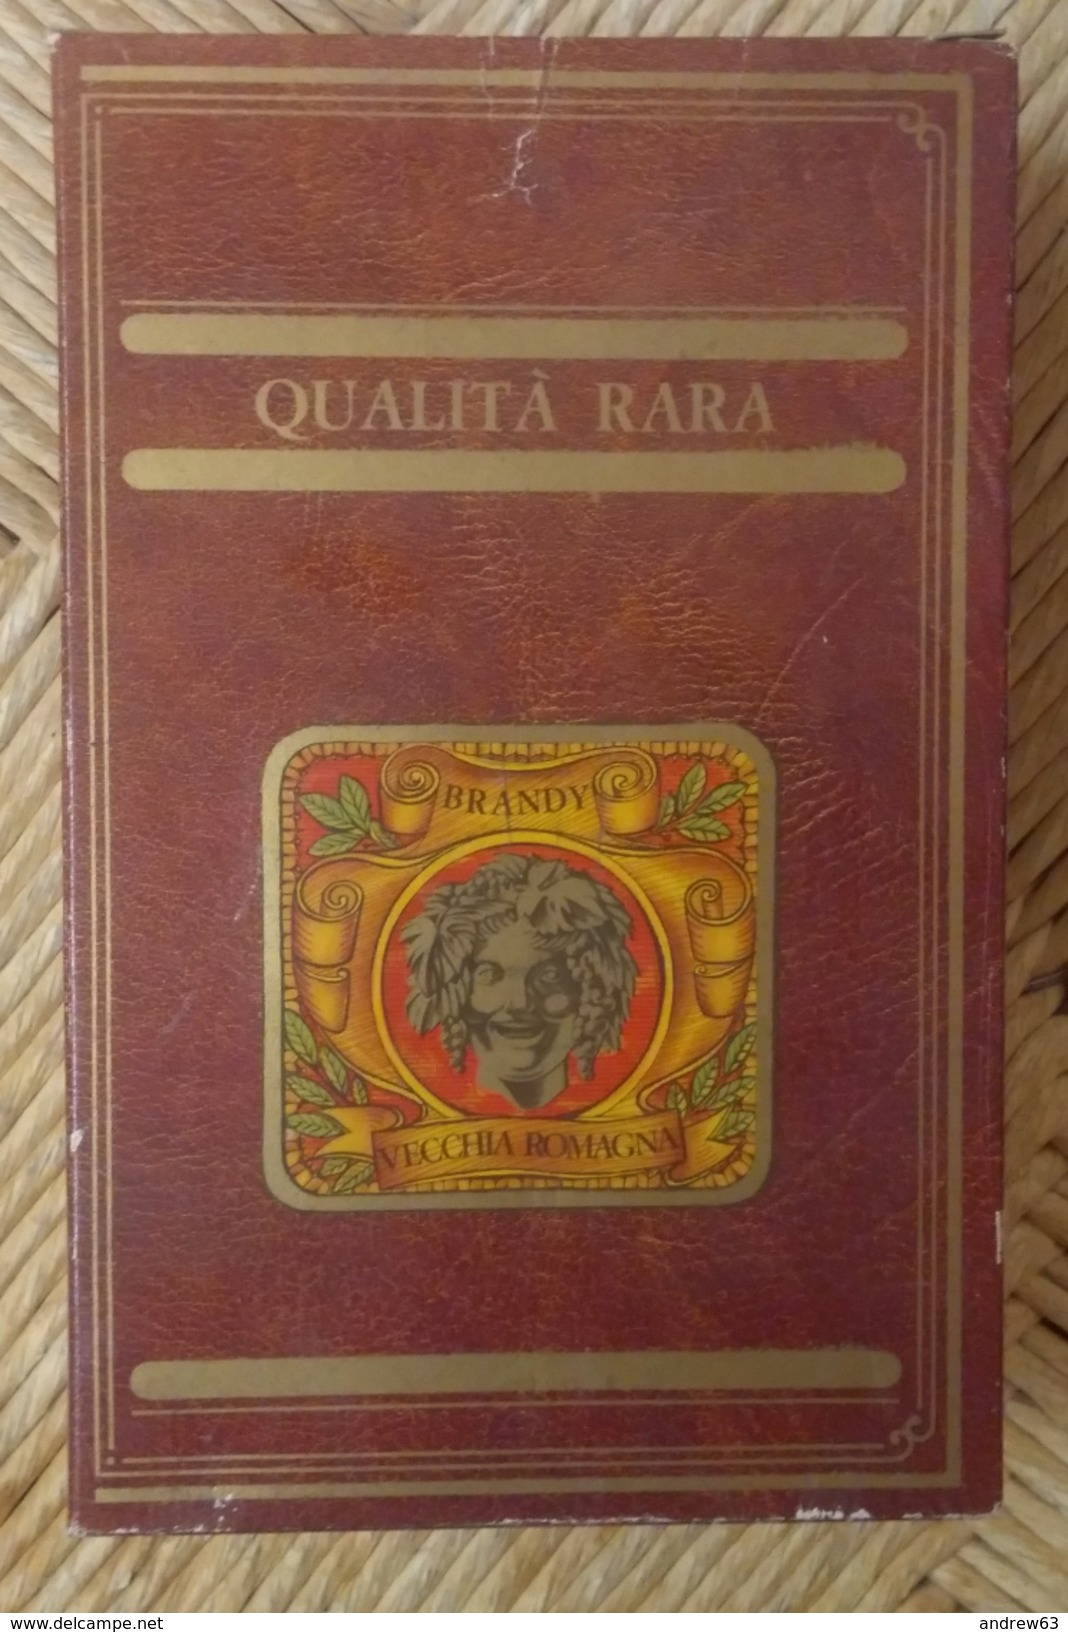 BRANDY VECCHIA ROMAGNA QUALITA' RARA GIO BUTON Lt. 0,750 Gr. 41° + BOX N° 38879 - Spirituosen